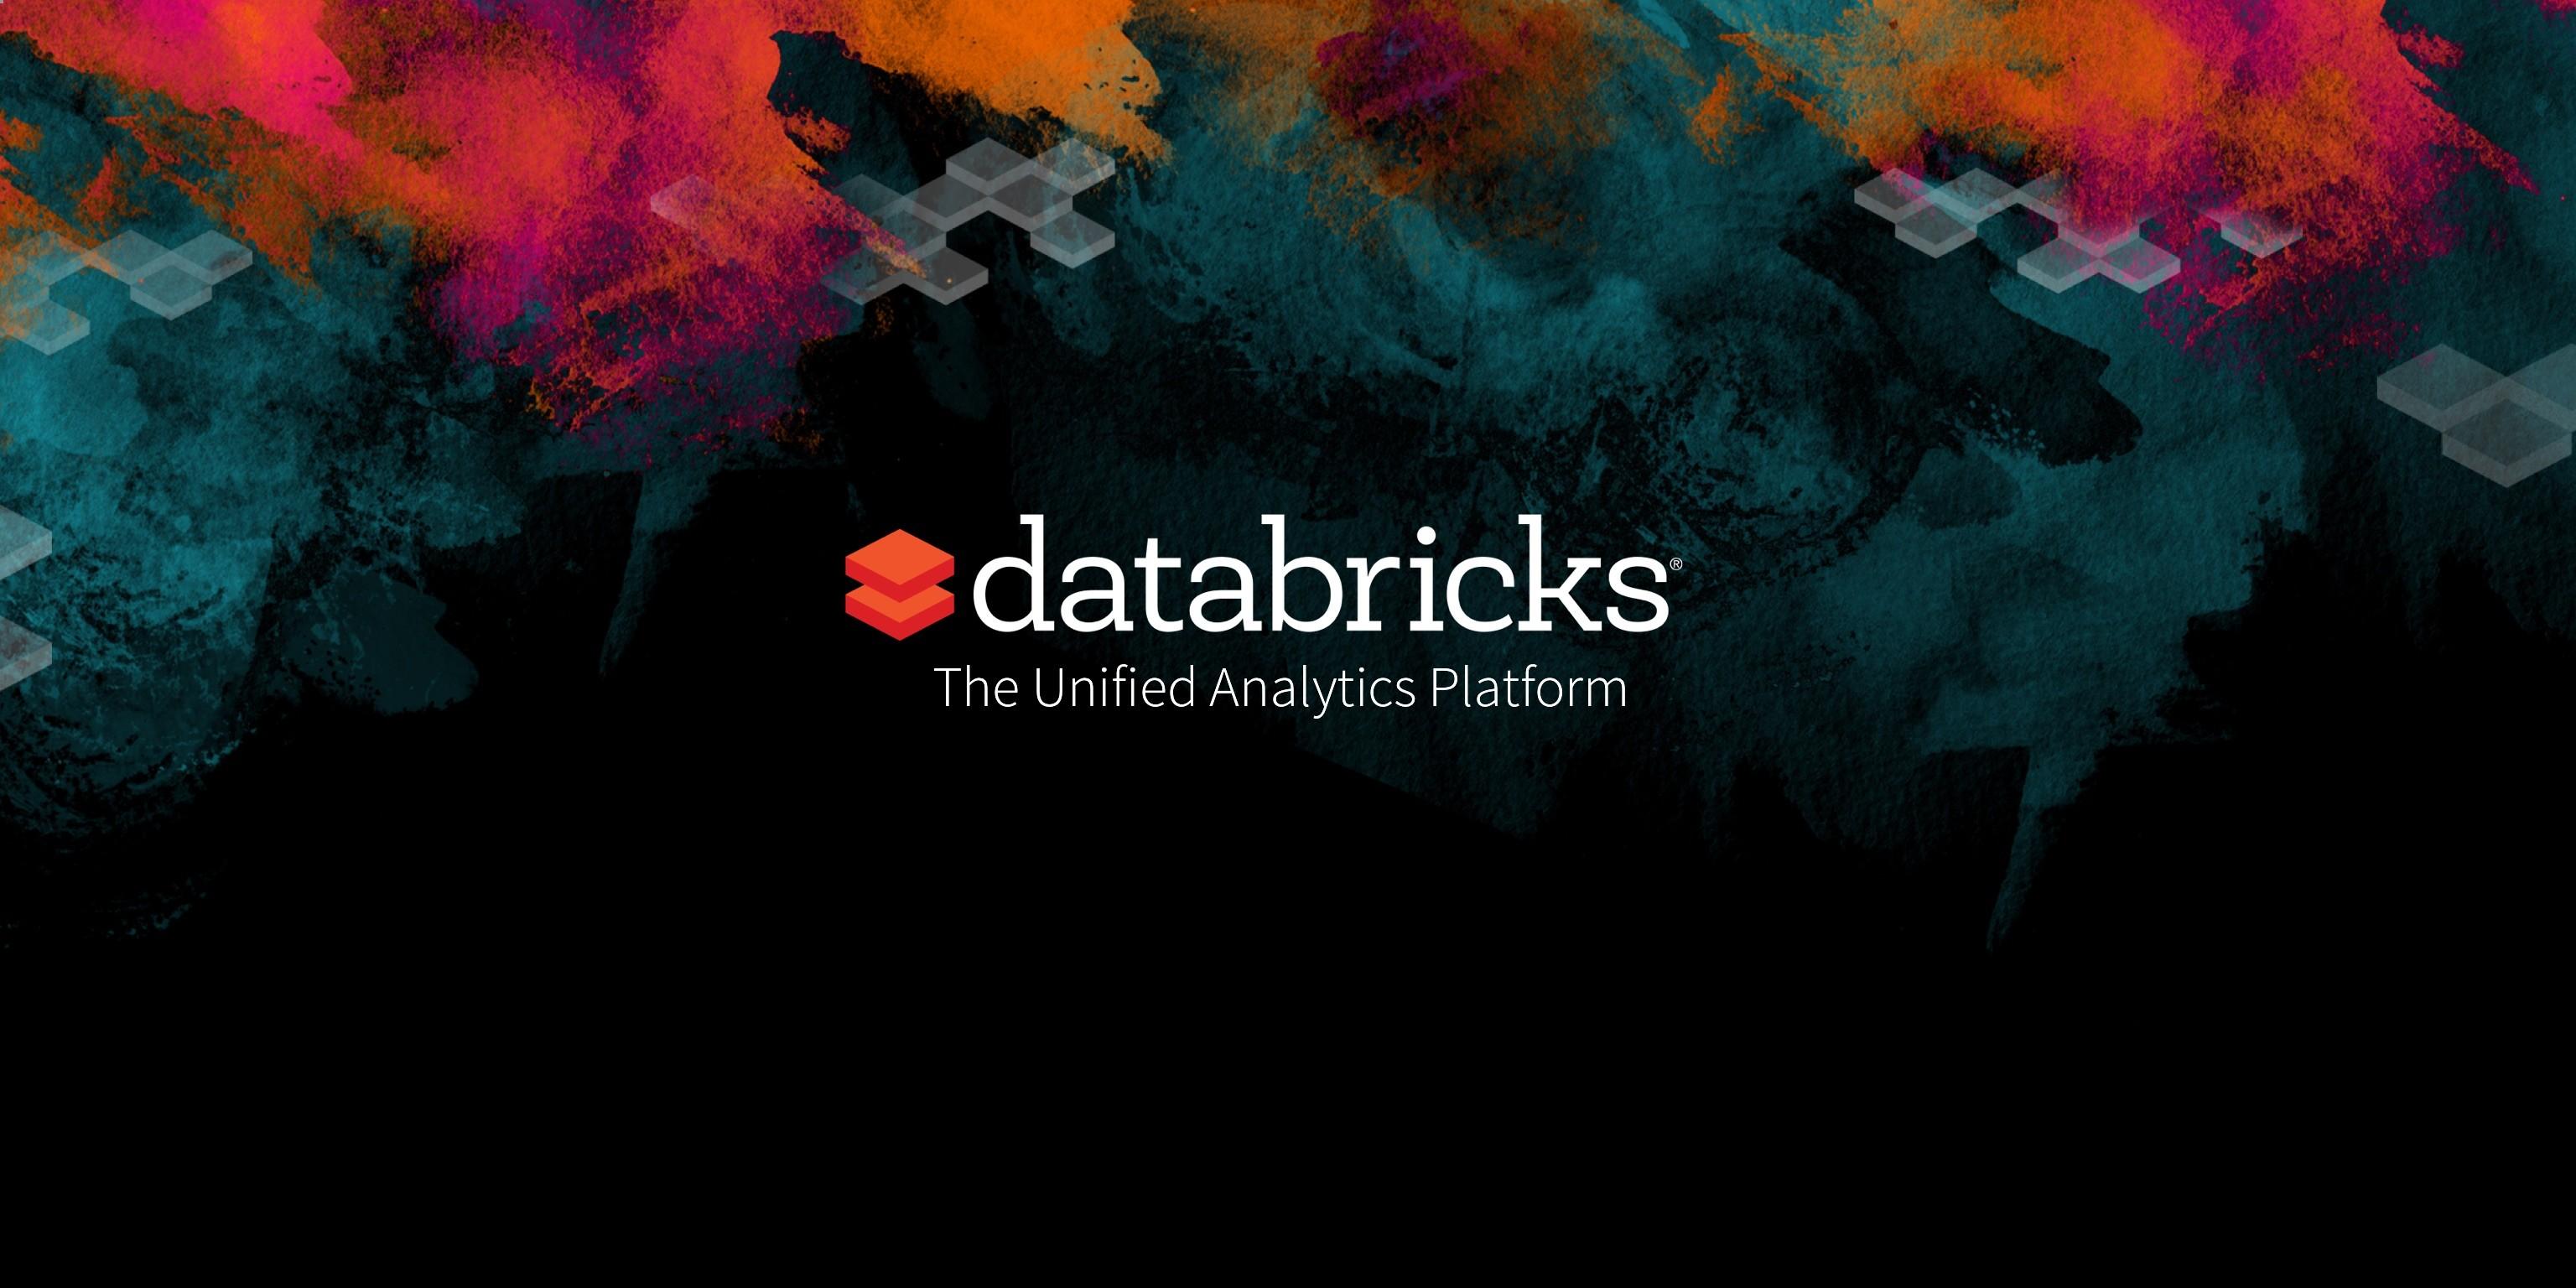 Databricks | LinkedIn